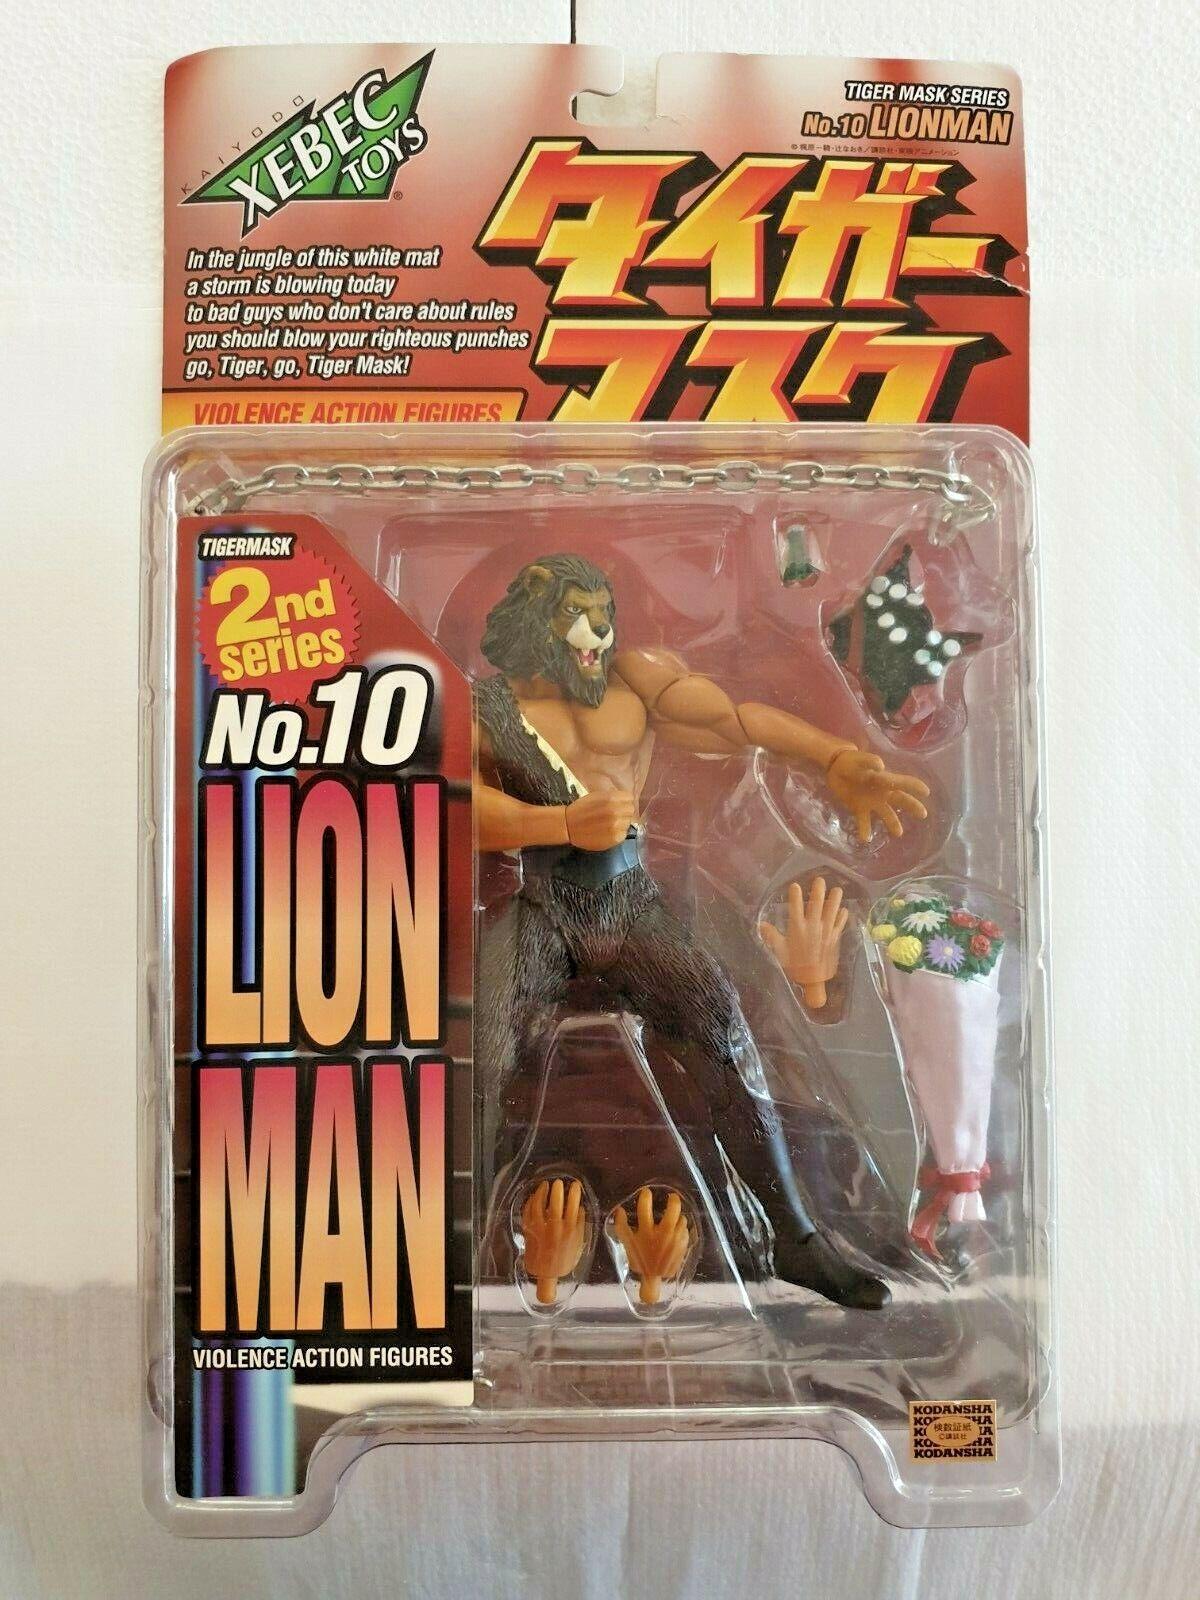 Xebec Toys Våld Handling Figures herrar Tiger Mask Serie Nr 10 Lion Man